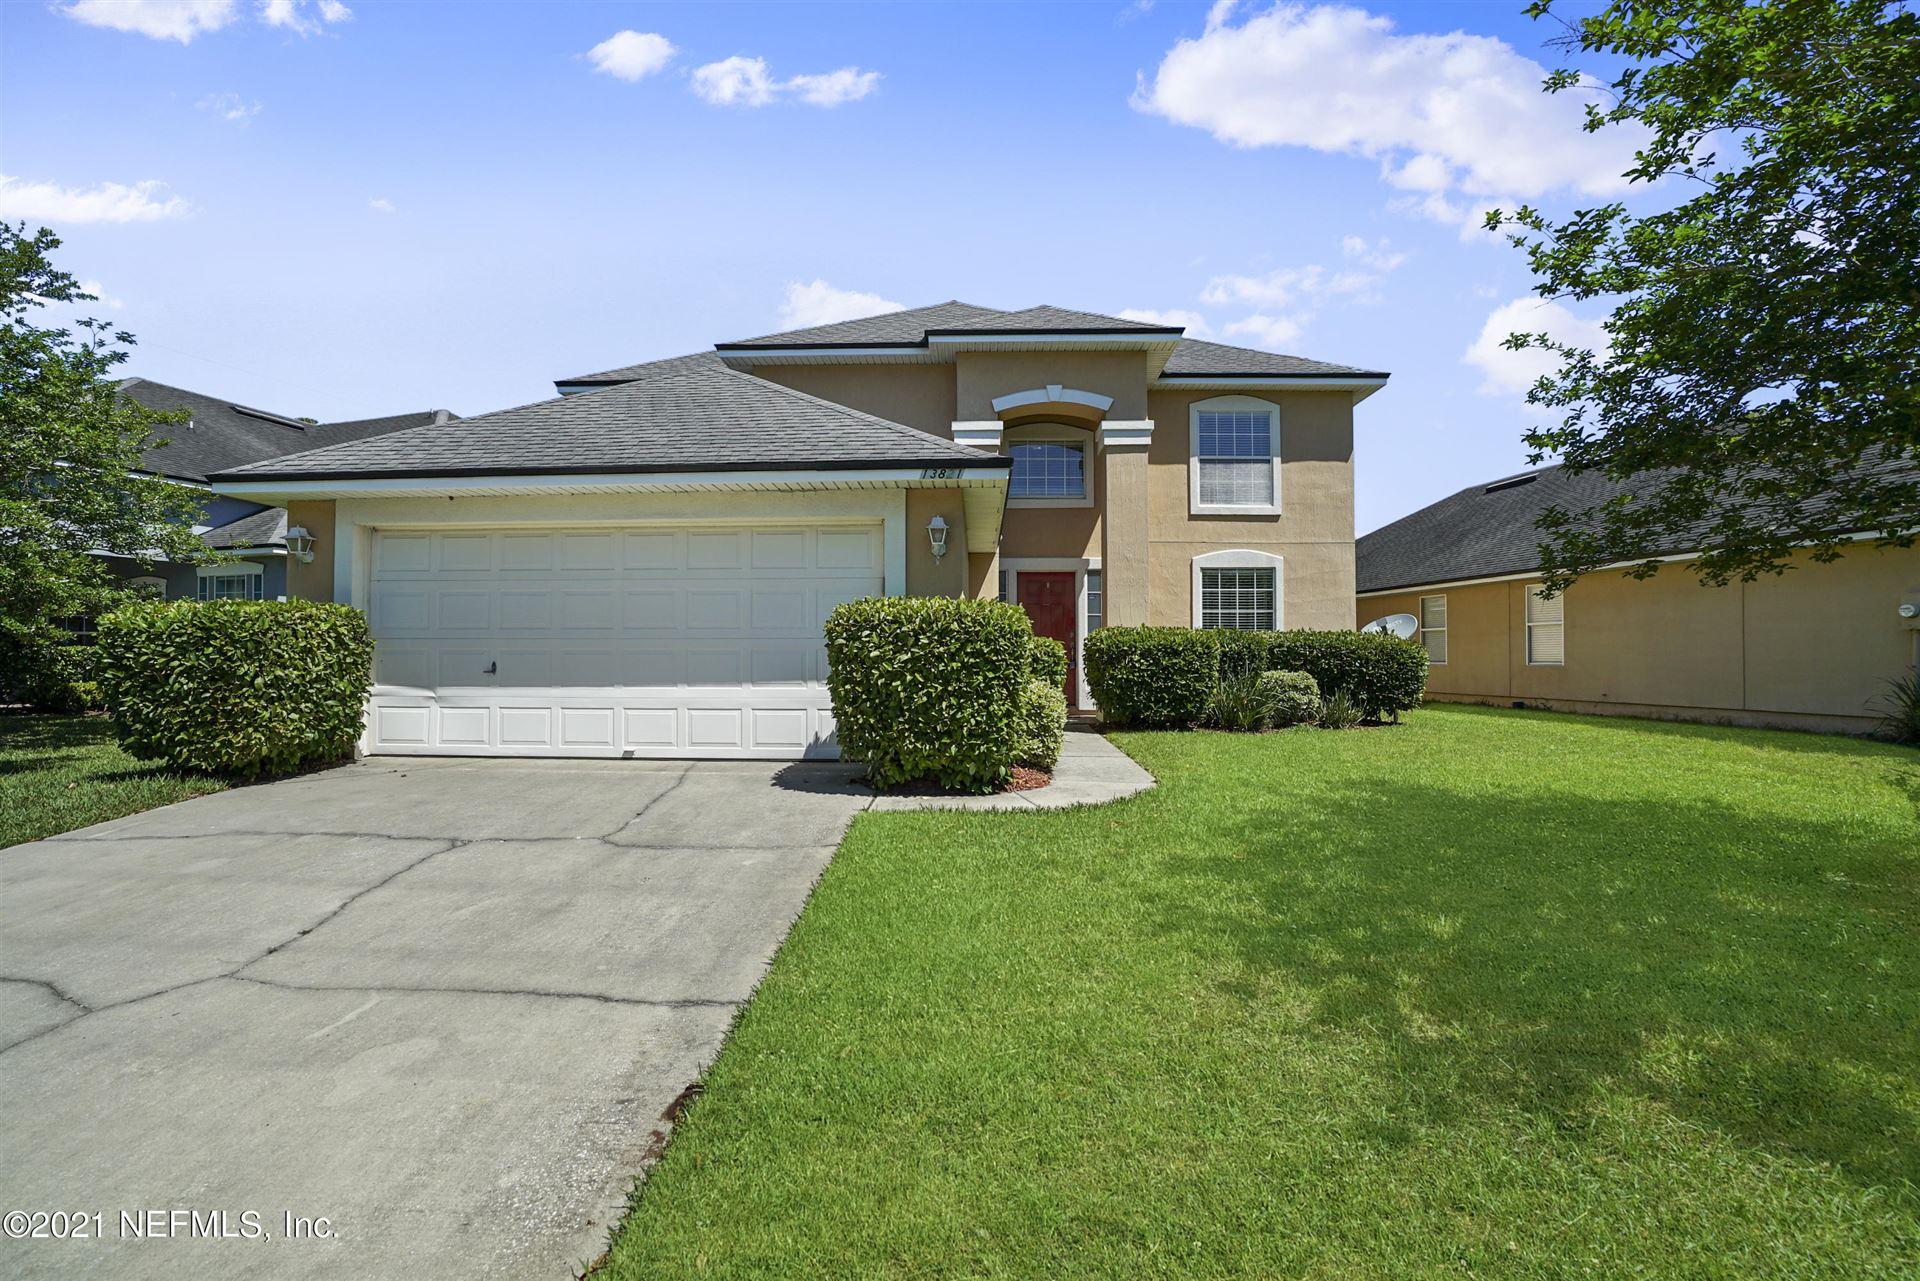 Photo of 13821 ZION GATE CT, JACKSONVILLE, FL 32224 (MLS # 1107800)